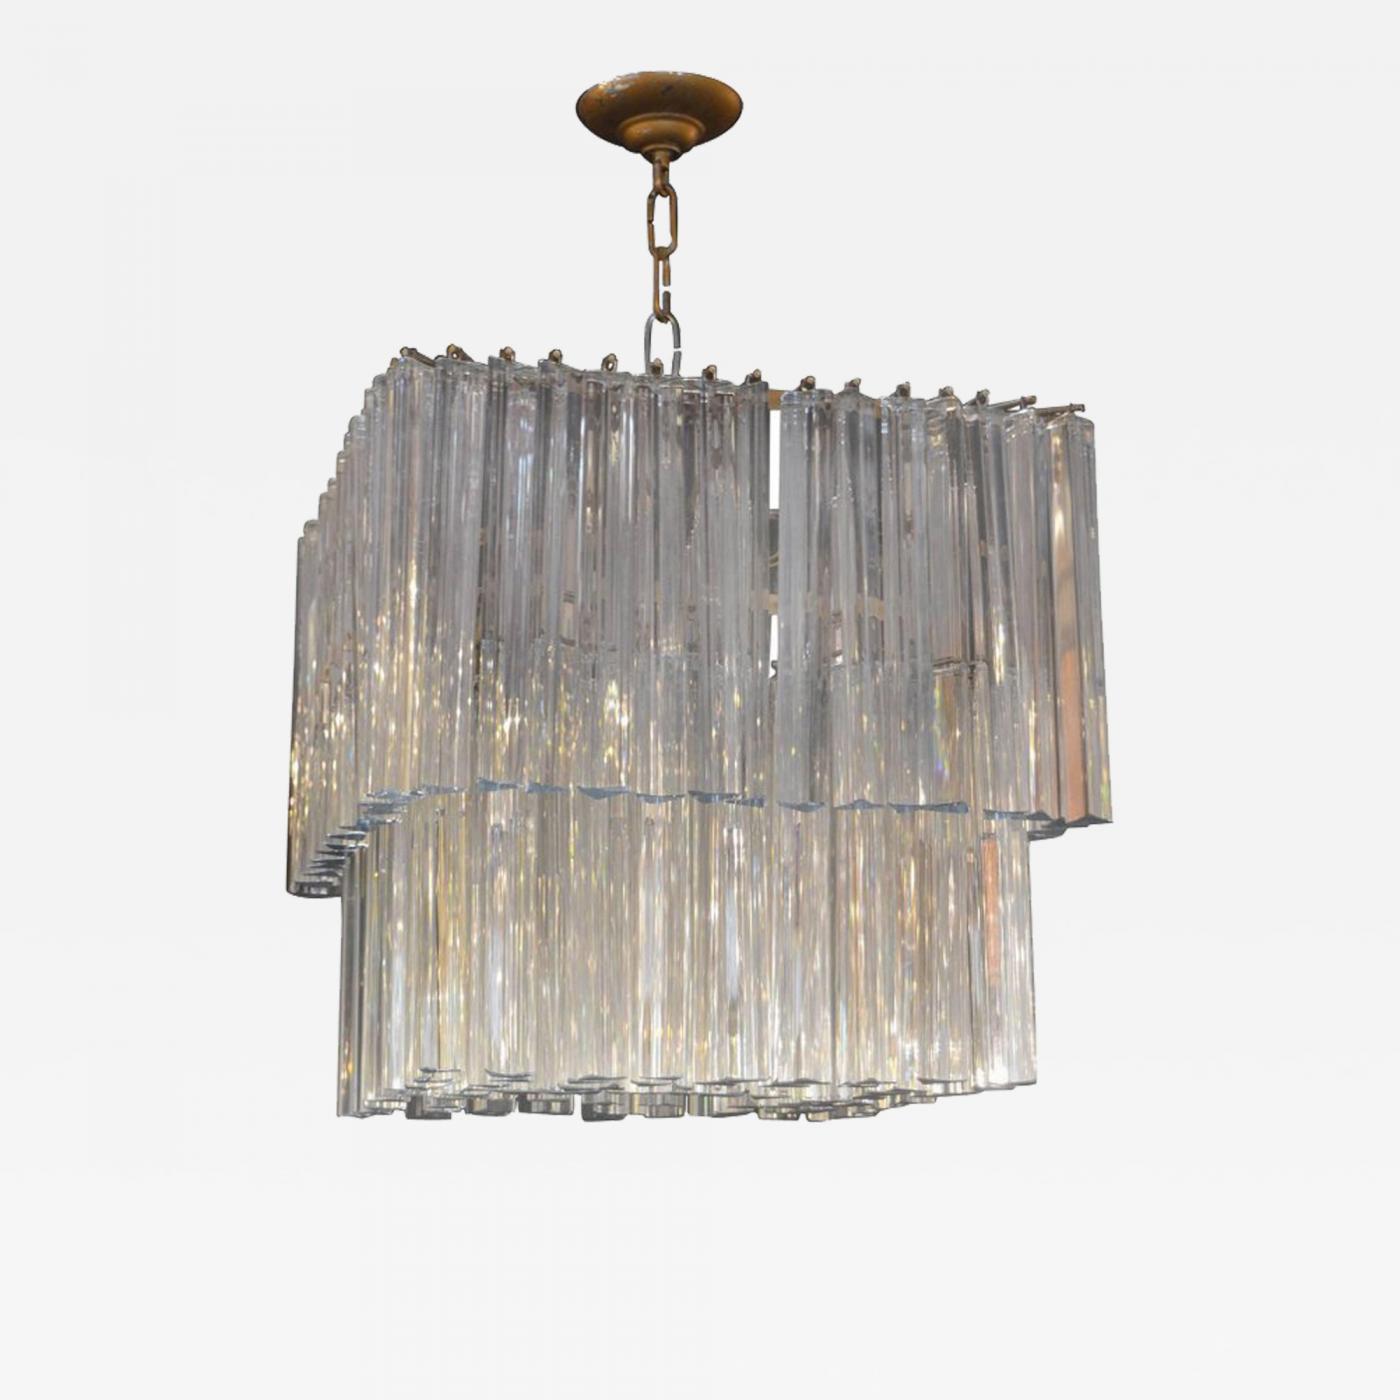 Venini square venini chandelier listings furniture lighting chandeliers and pendants aloadofball Images